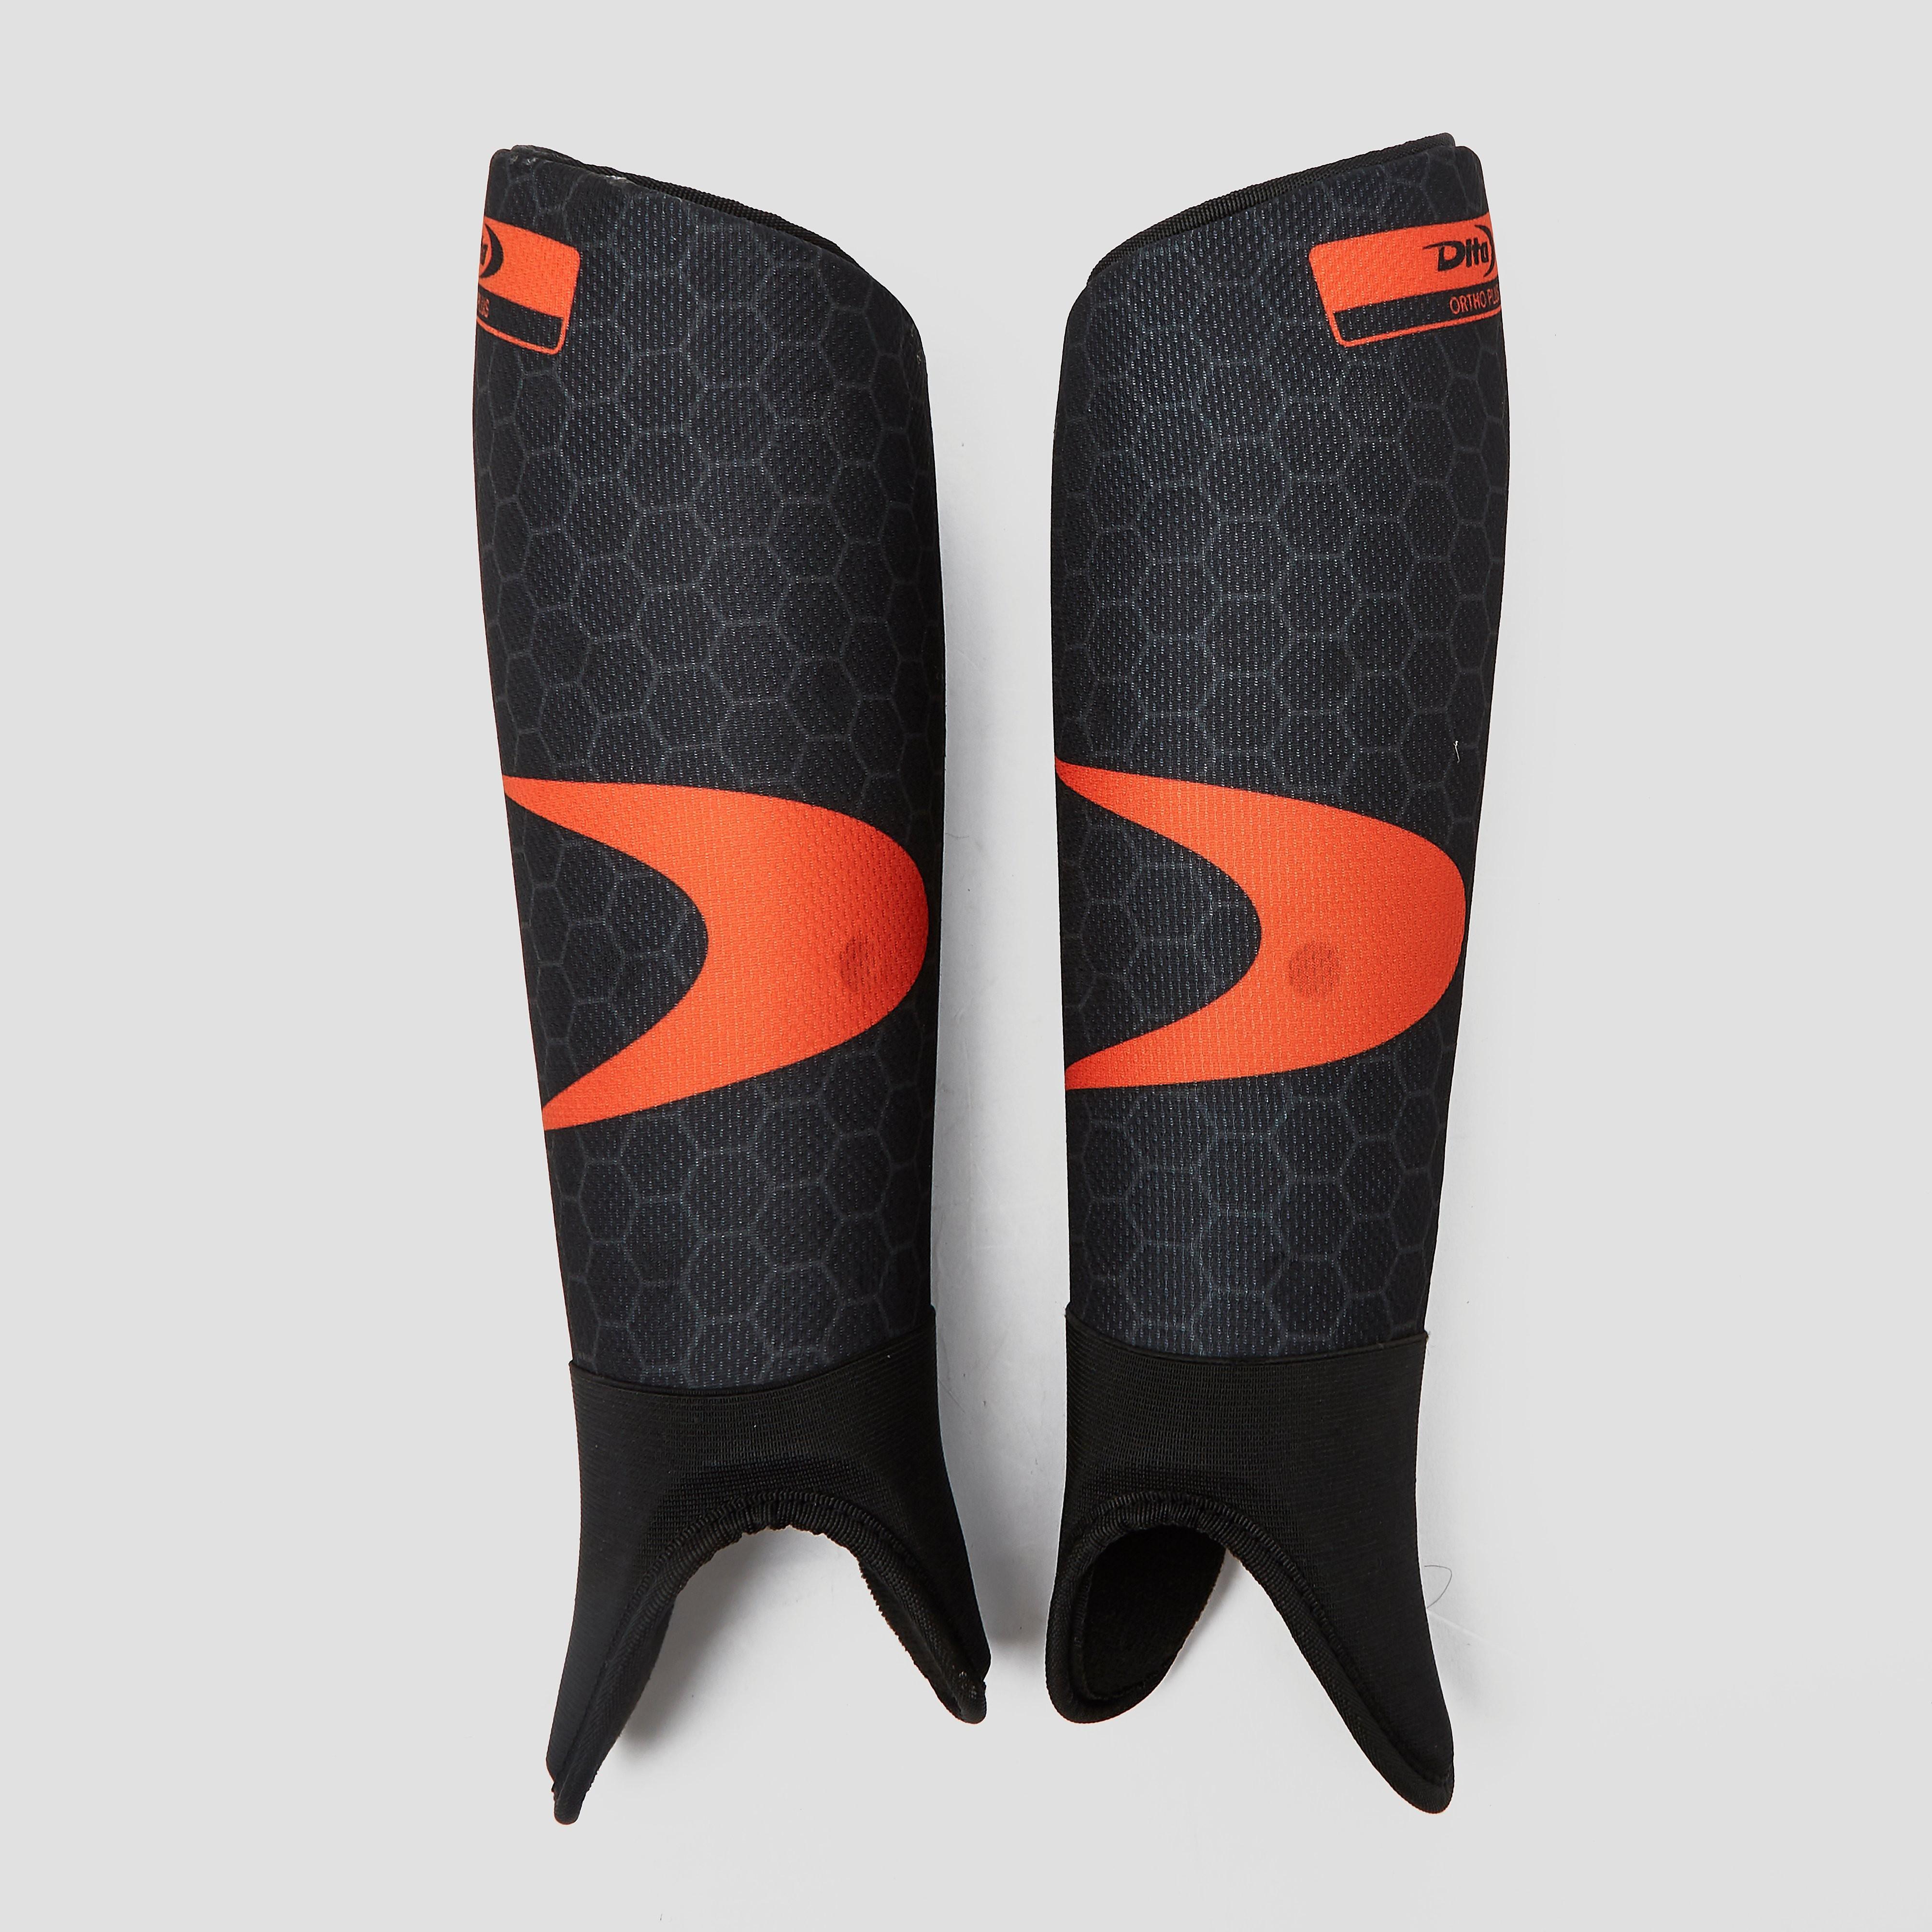 Dita ortho plus 17 hockey scheenbeschermers zwart/oranje